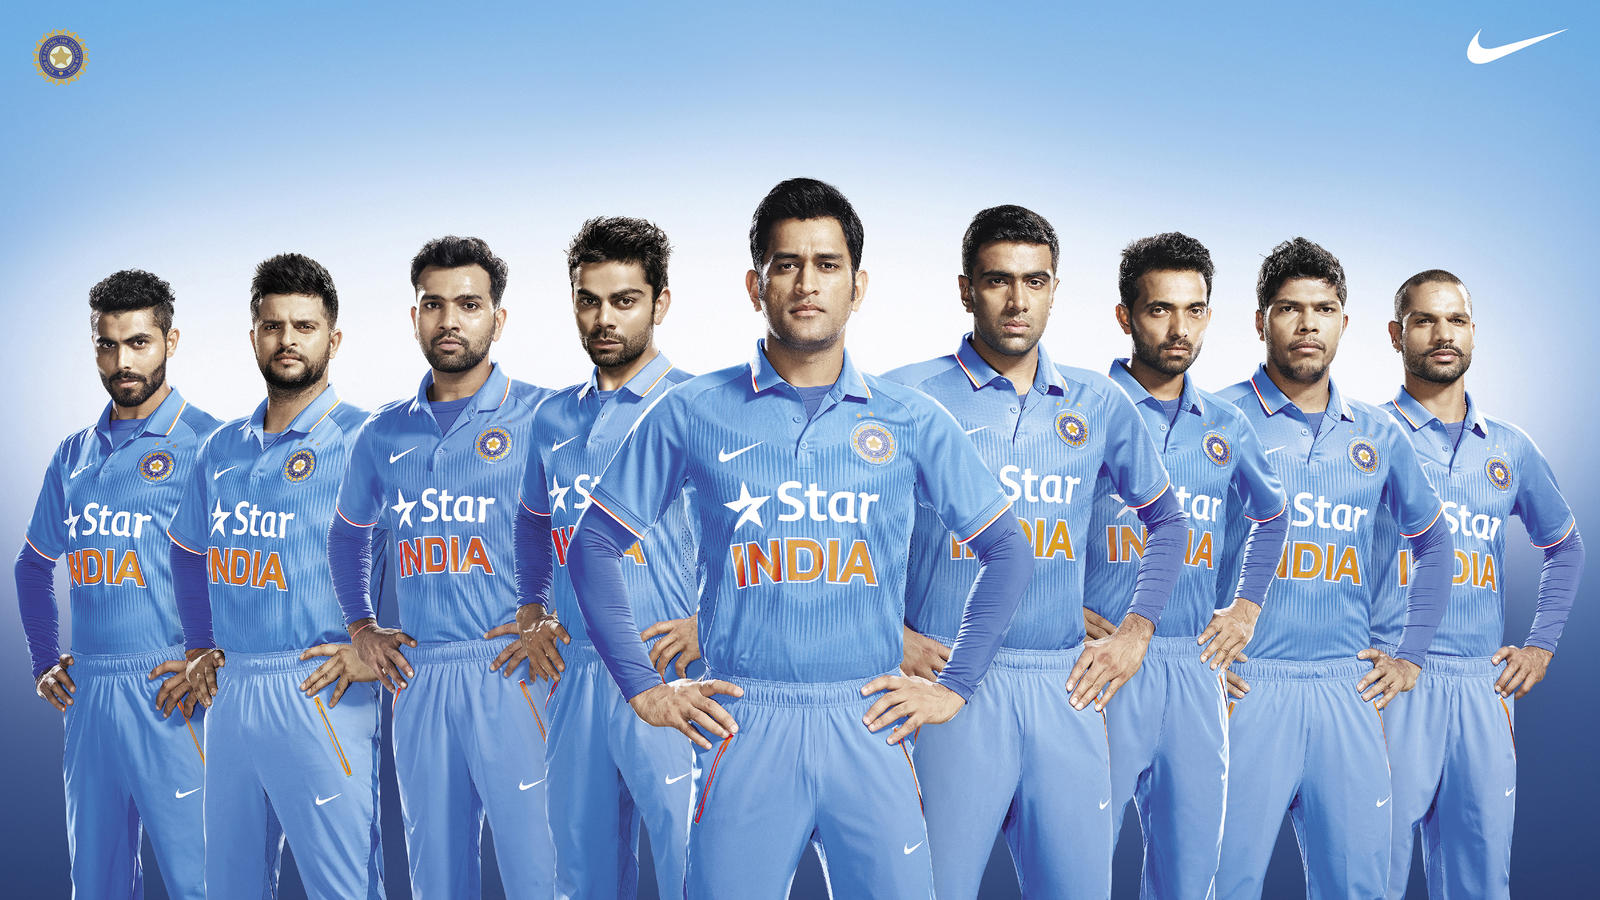 team india new jersey buy online